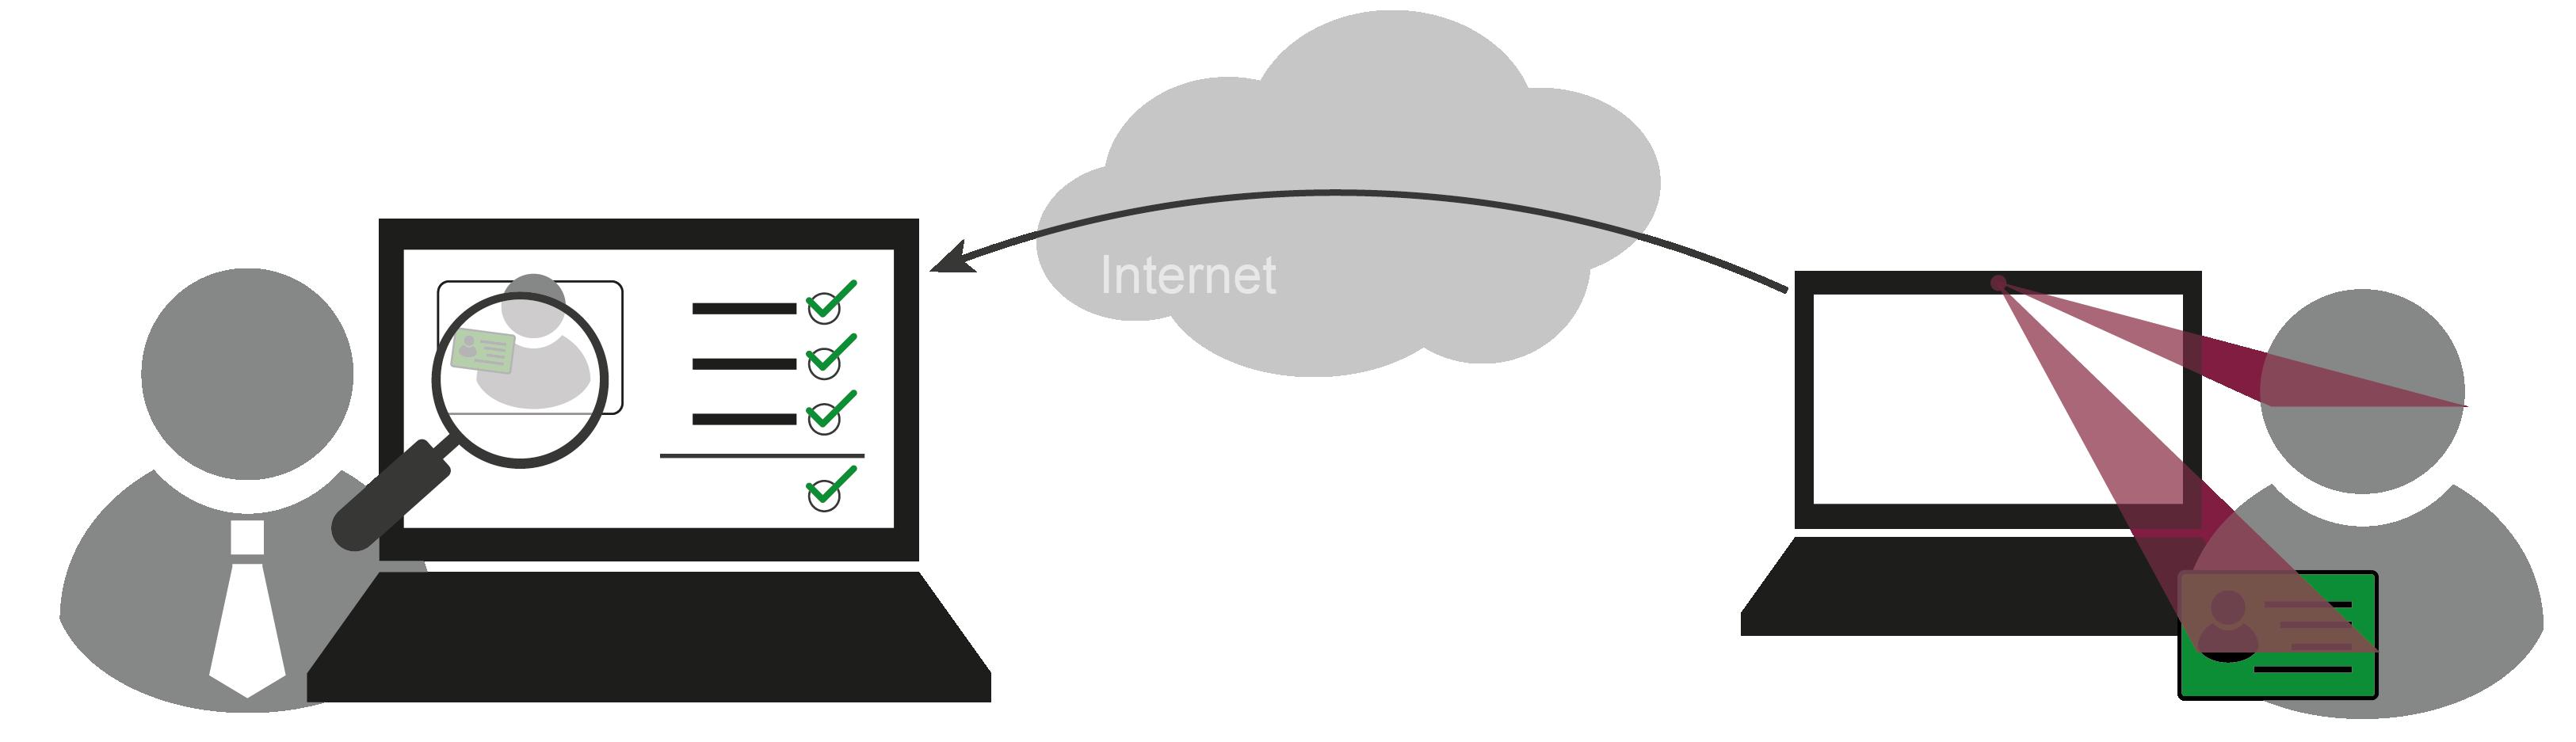 VideoIdent / Videoidentifikation - Glossar Cyber-Sicherheit - Prof. Norbert Pohlmann